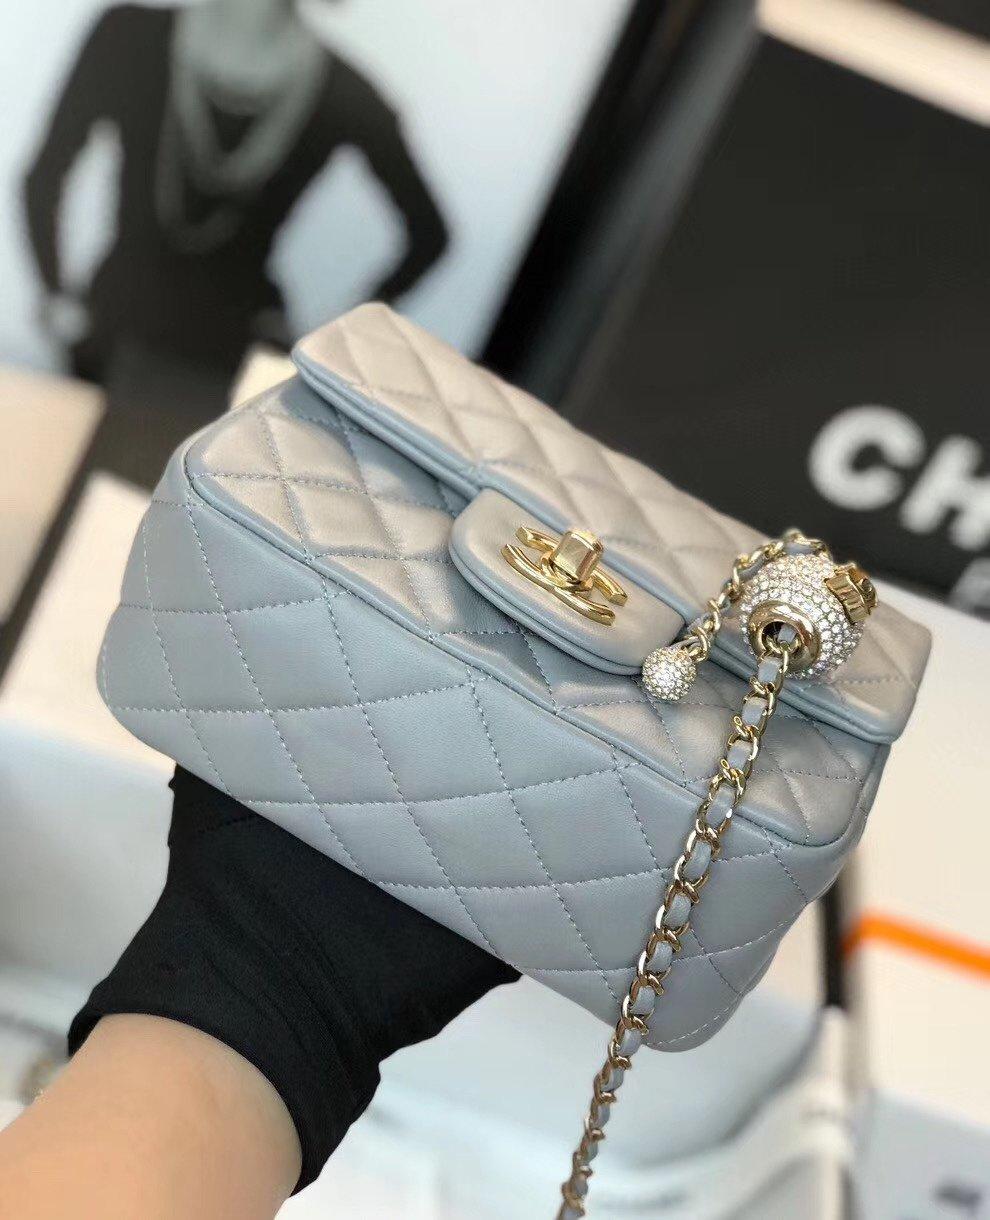 Chanel香奈儿专柜最新钻珠cf款(图7)